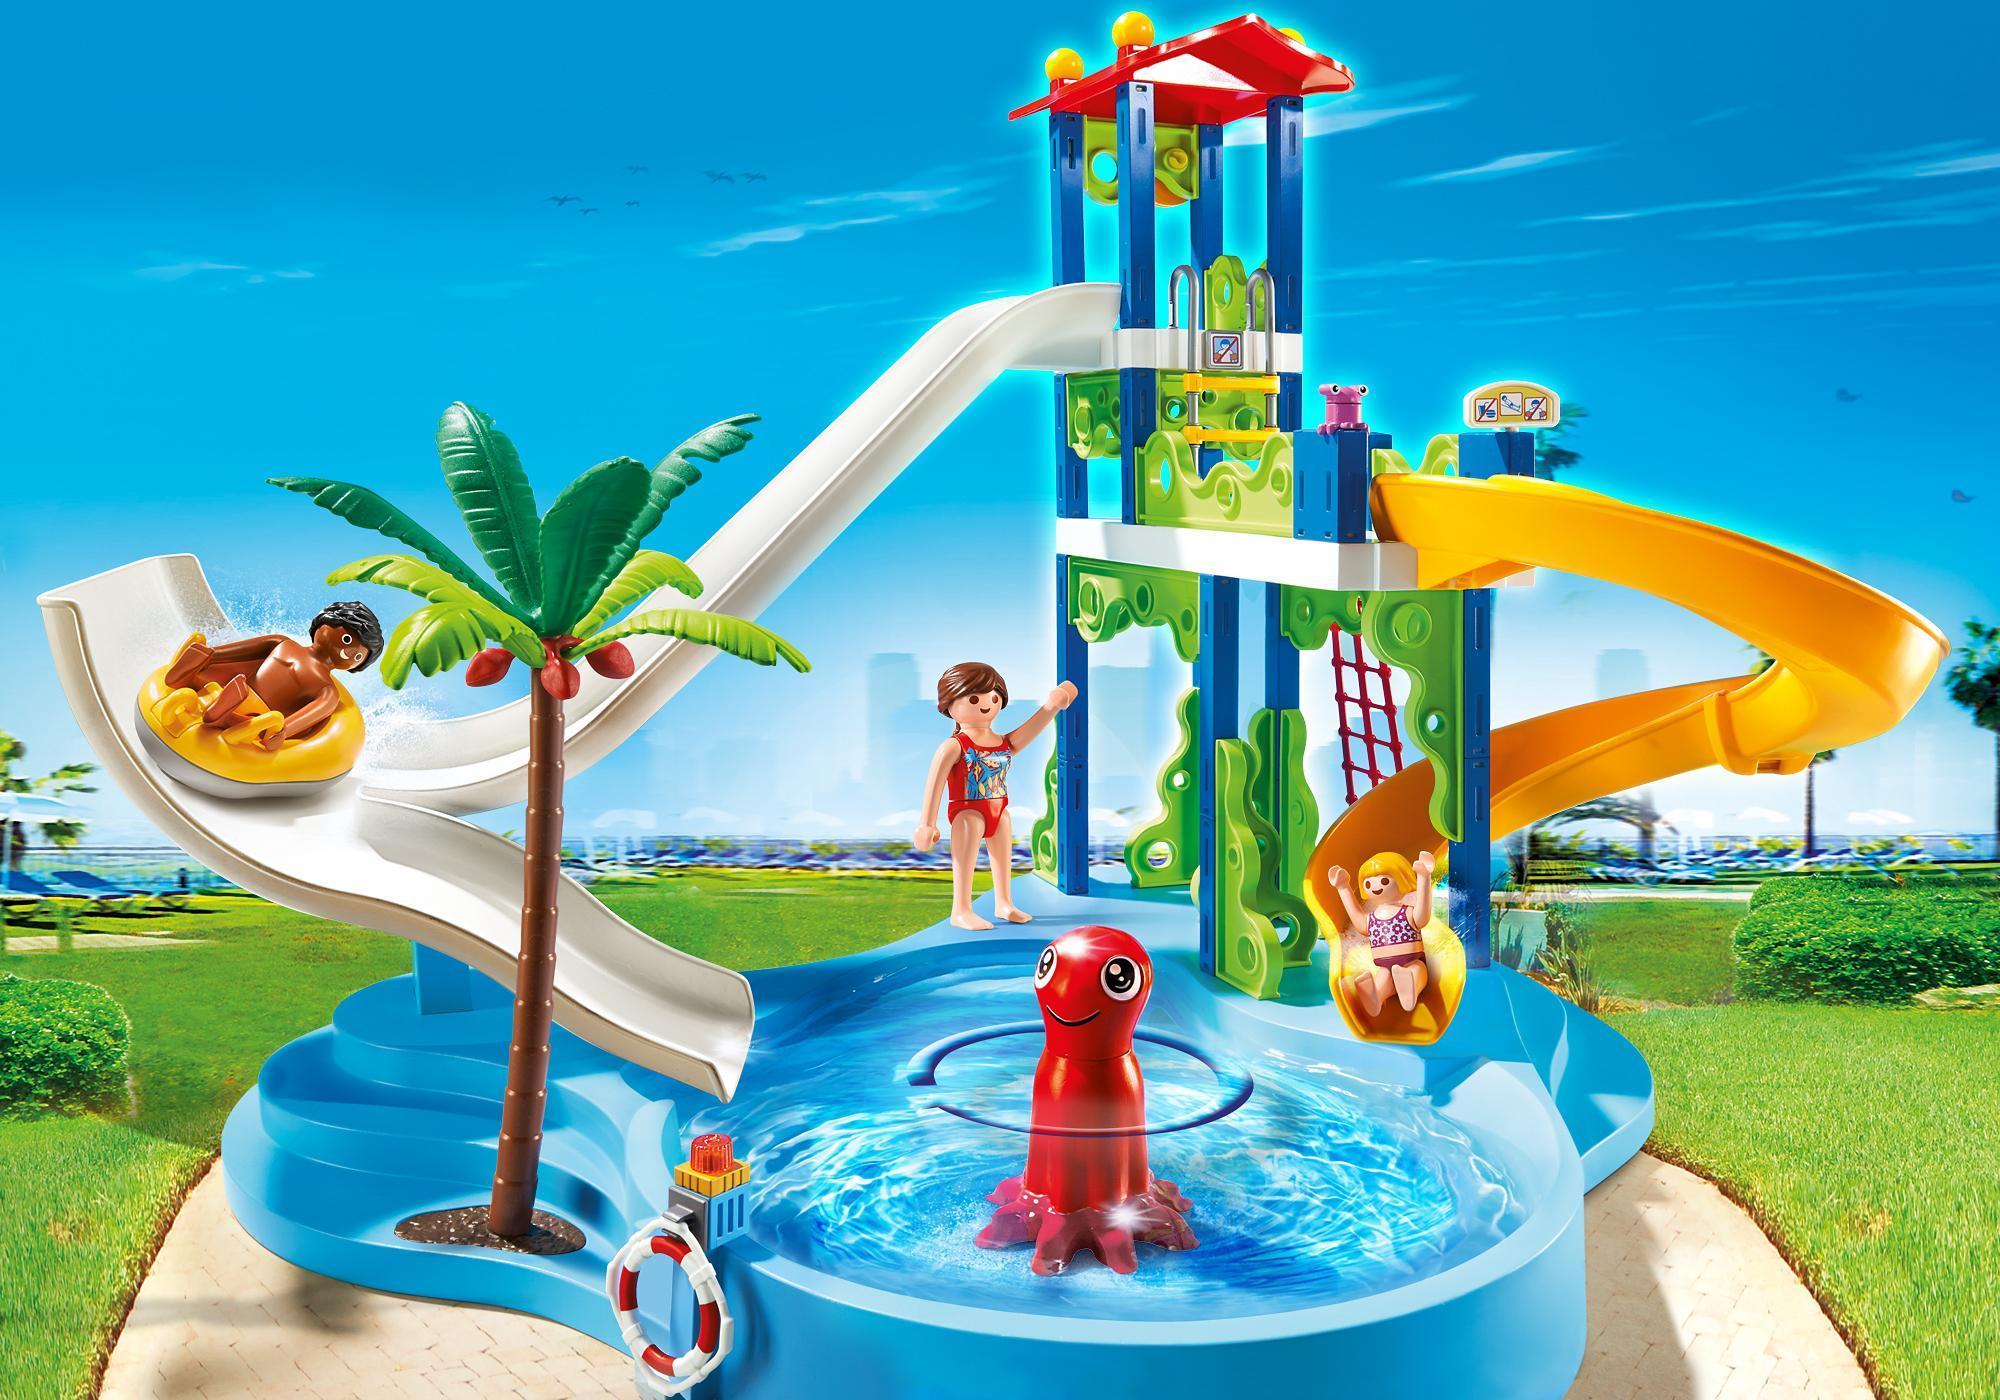 http://media.playmobil.com/i/playmobil/6669_product_detail/Parque Acuático con Toboganes